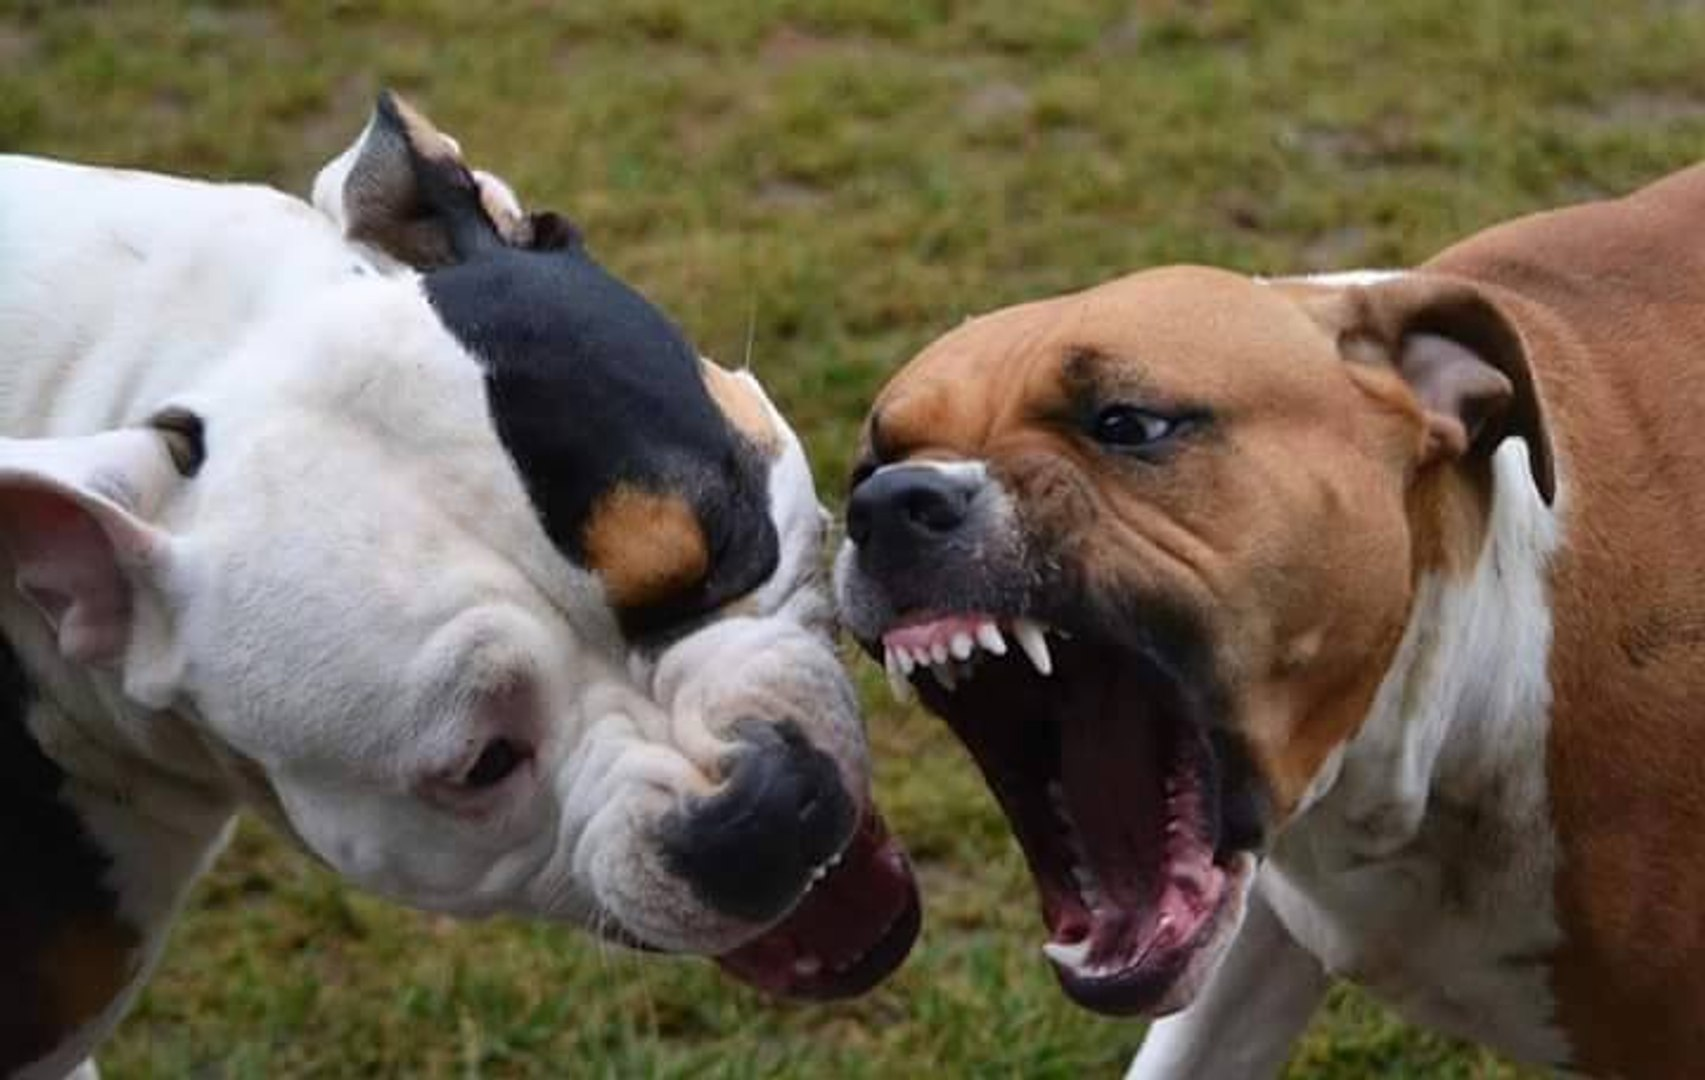 Pitbull vs Amstaff FACTS